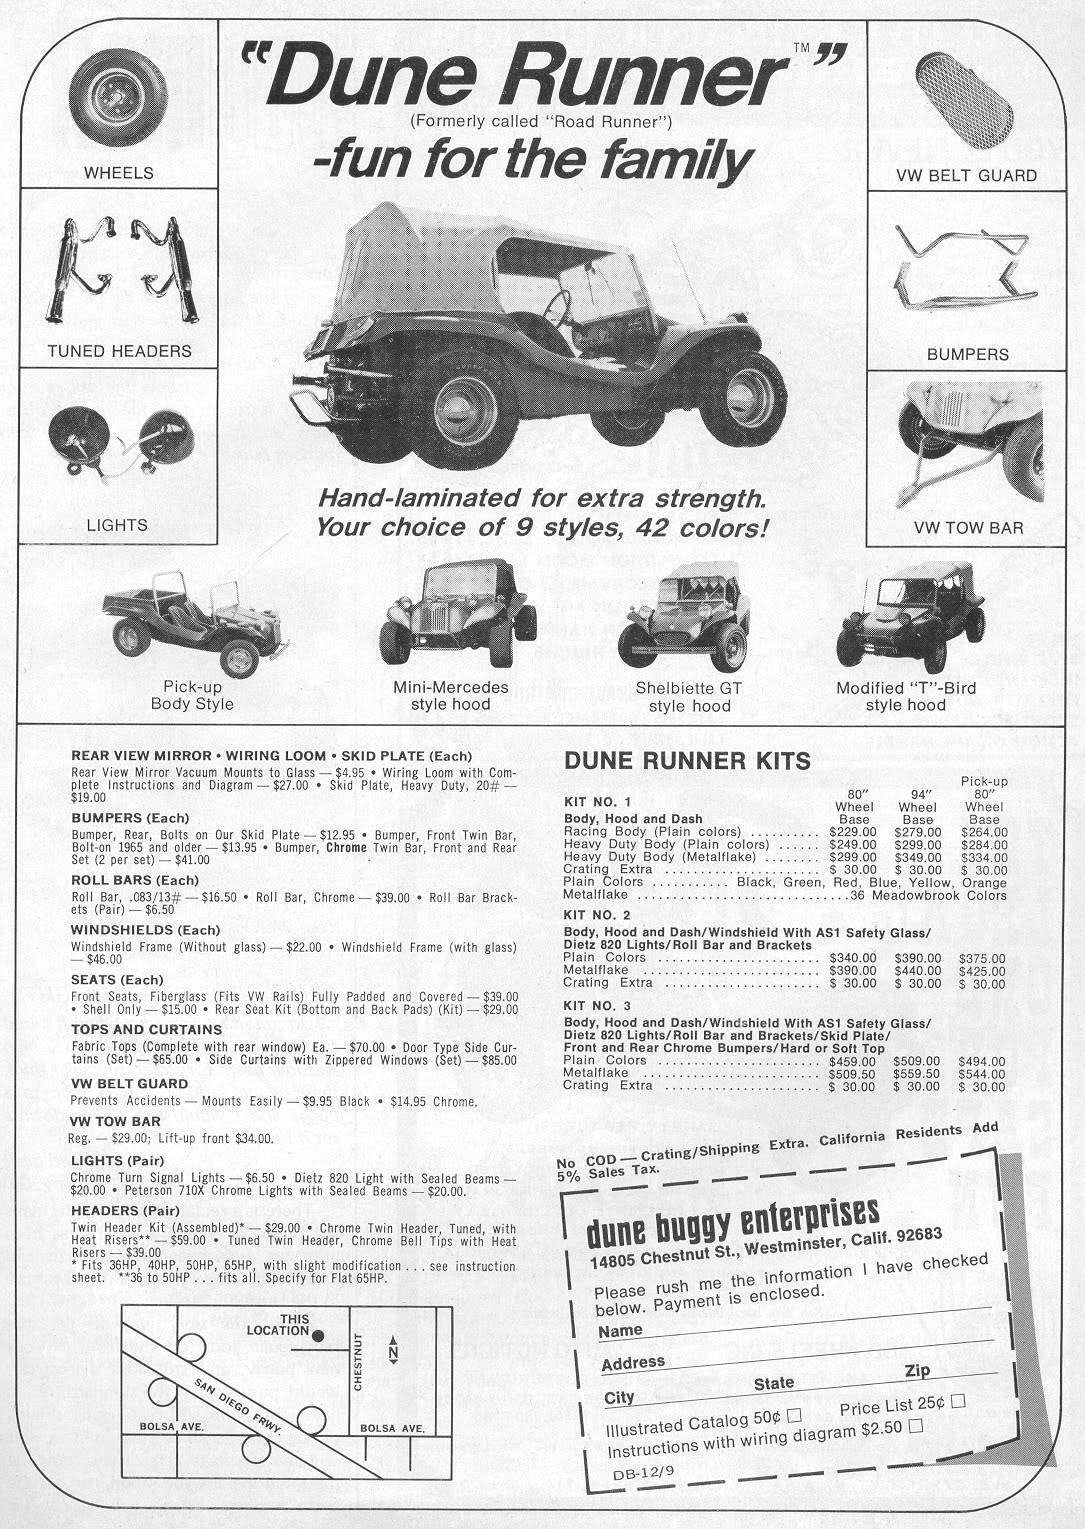 Original Vw Dune Buggy Ad